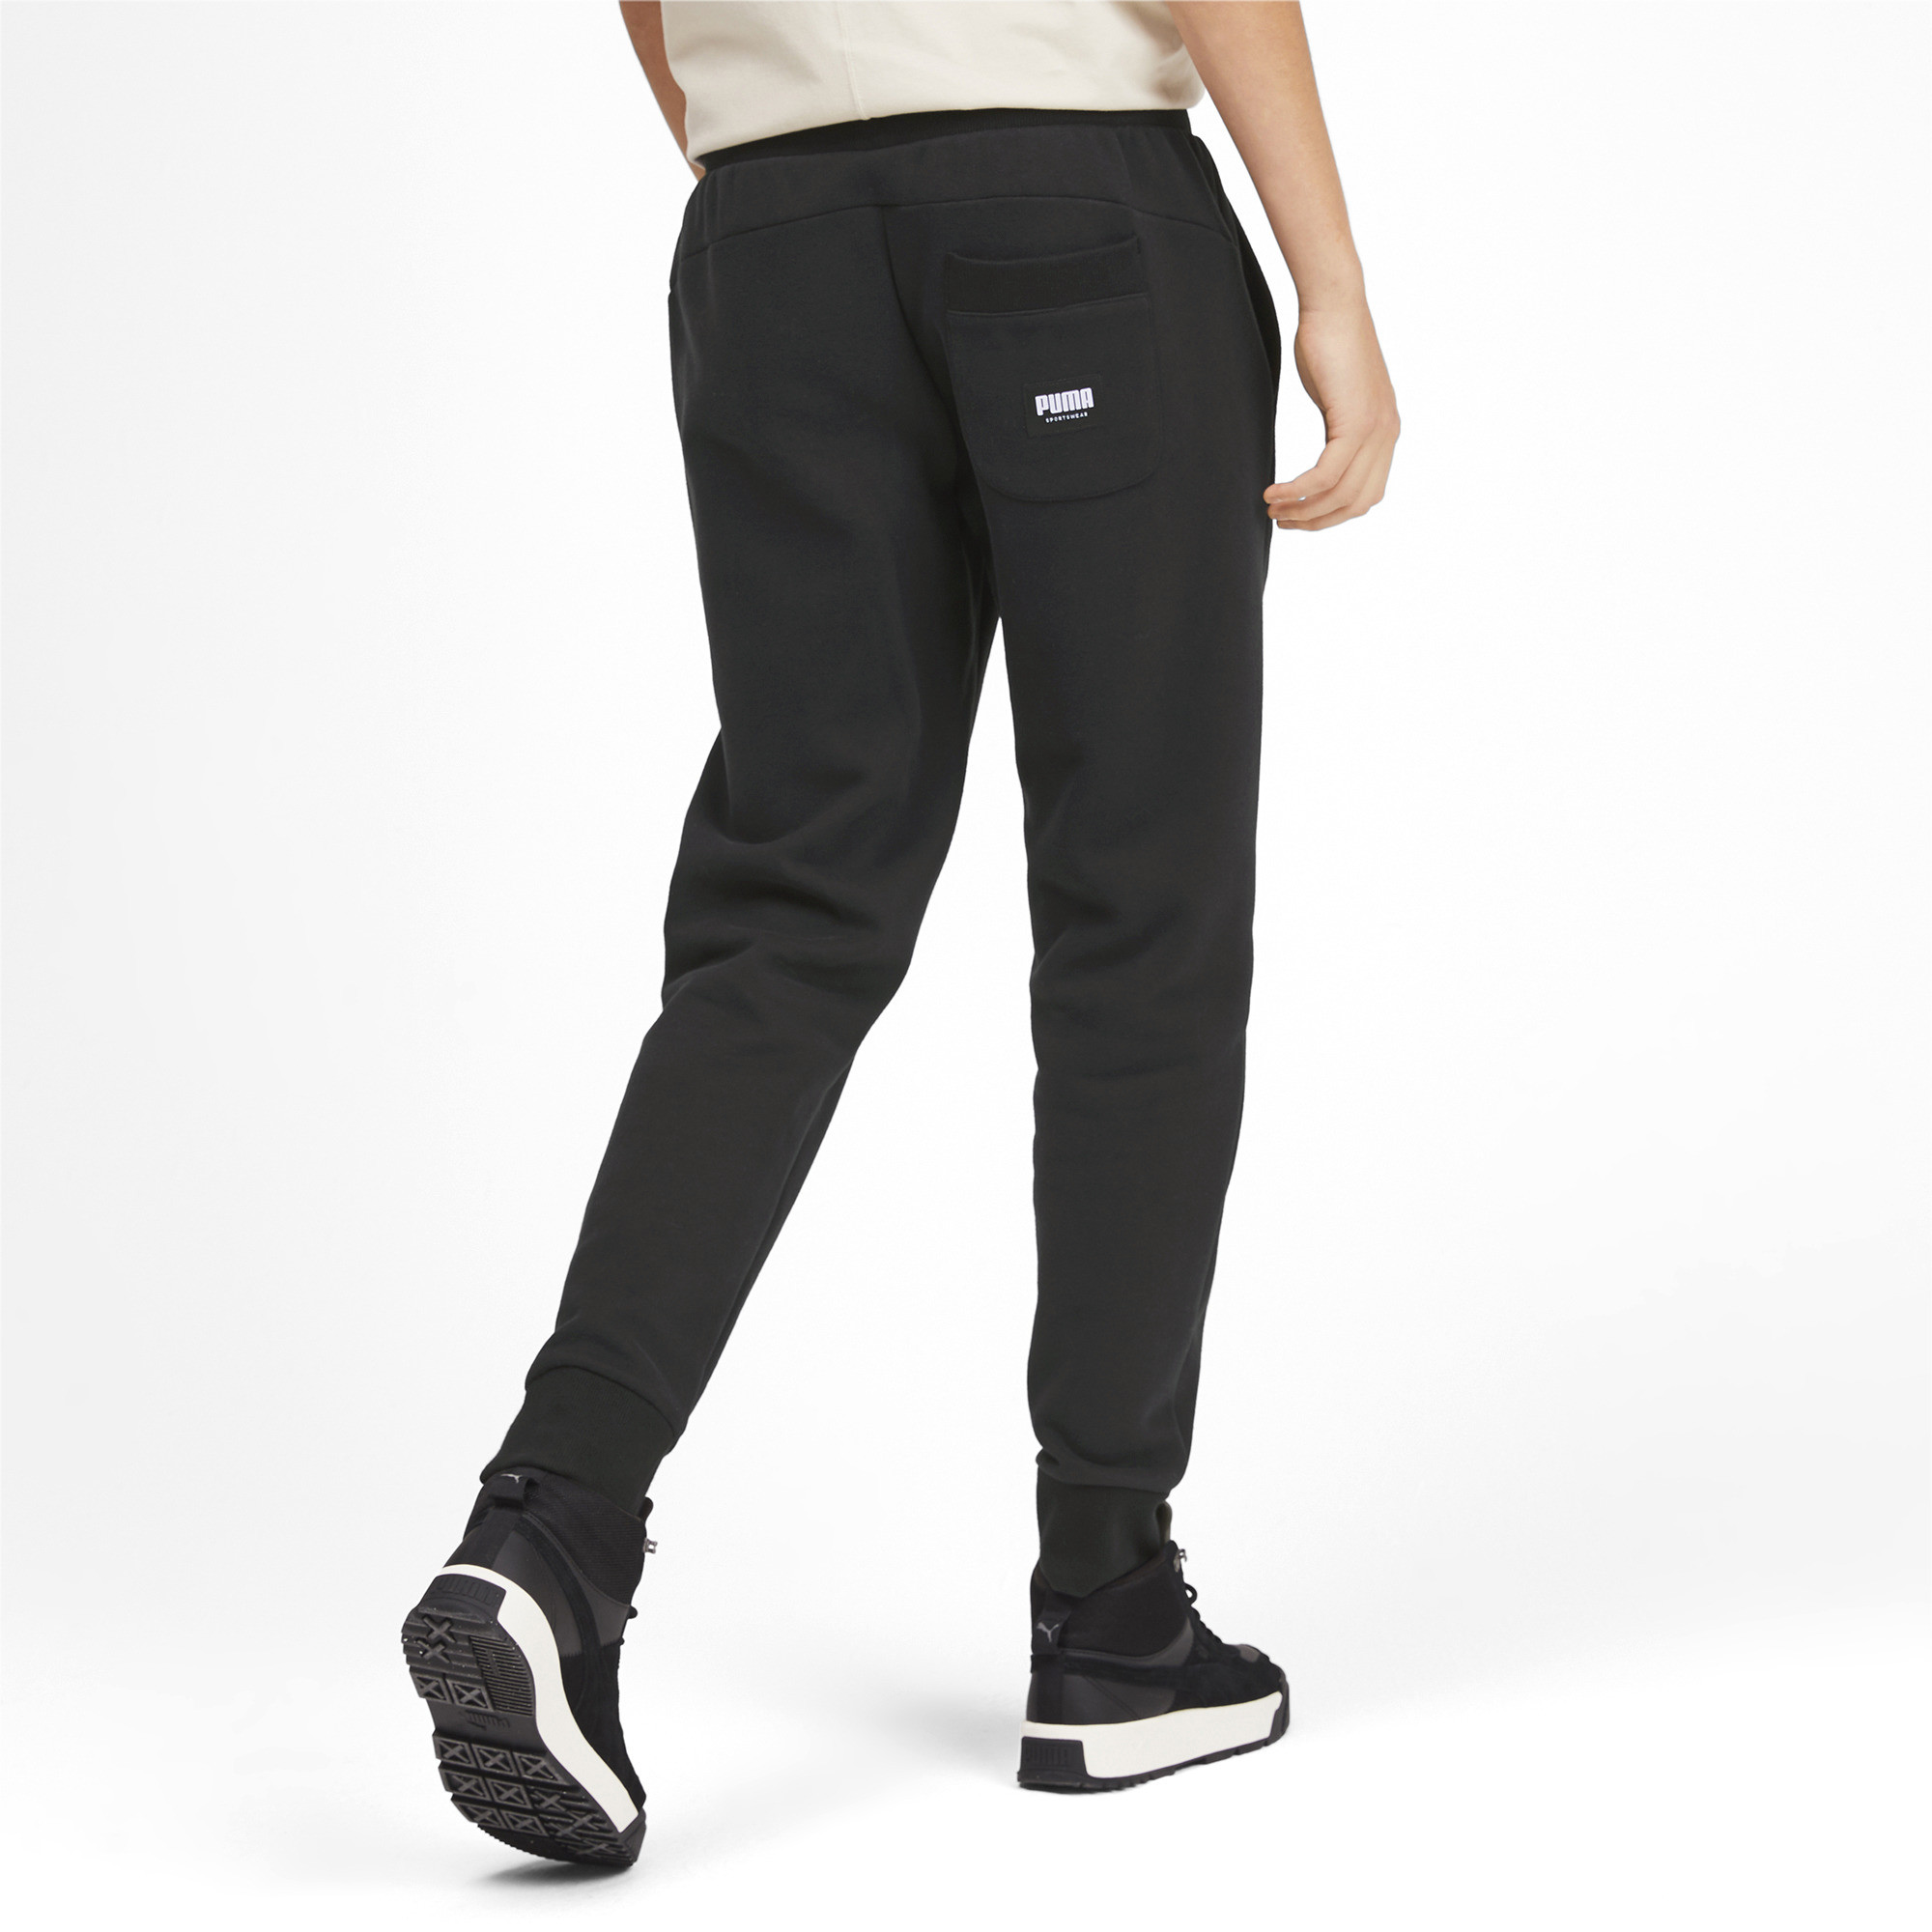 PUMA-Athletics-Men-039-s-Fleece-Pants-Men-Knitted-Pants-Basics thumbnail 10